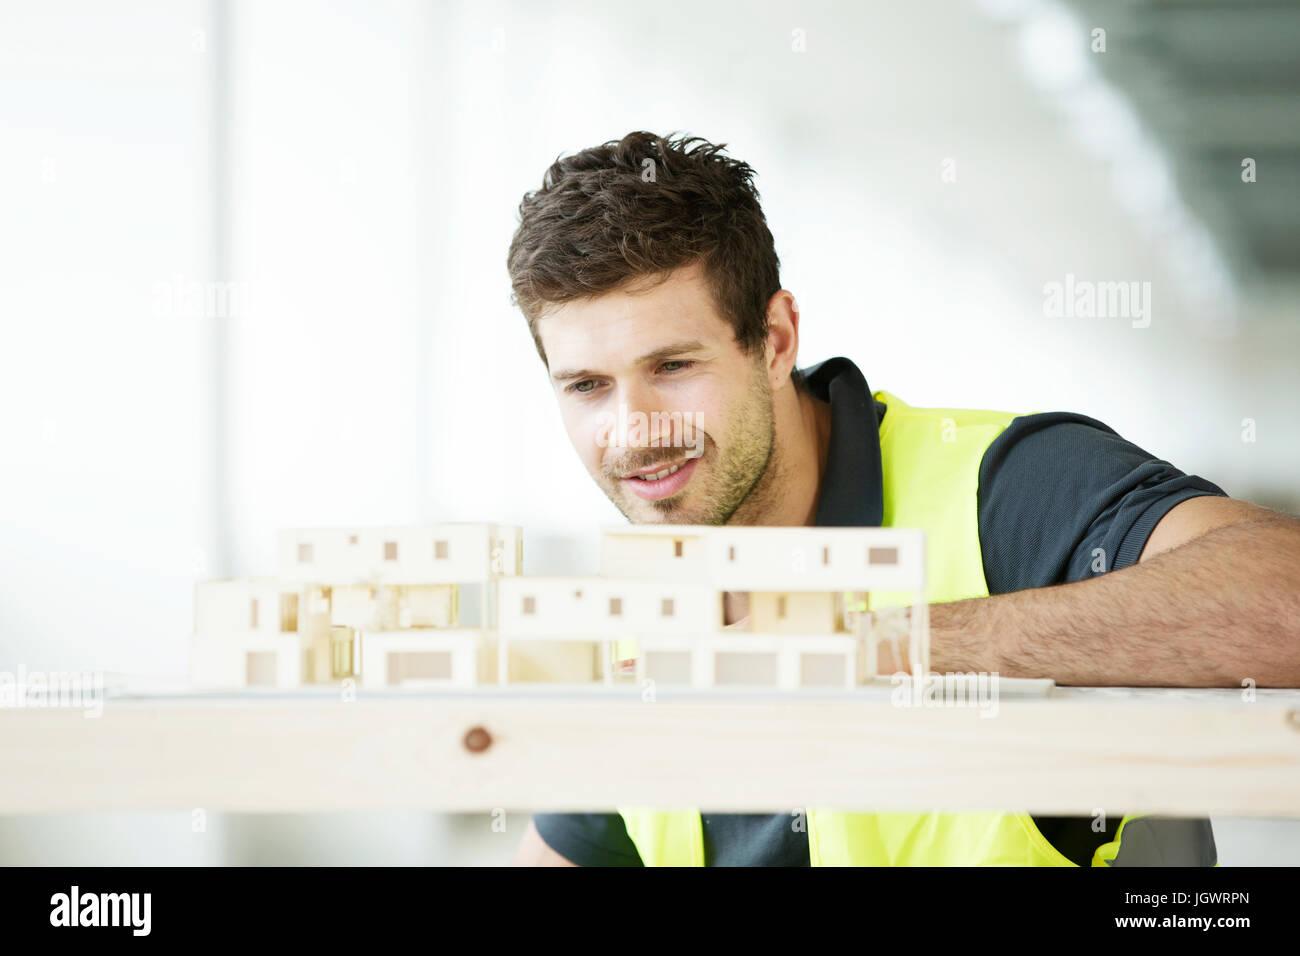 Man wearing hi vis vest, looking at model of building Stock Photo